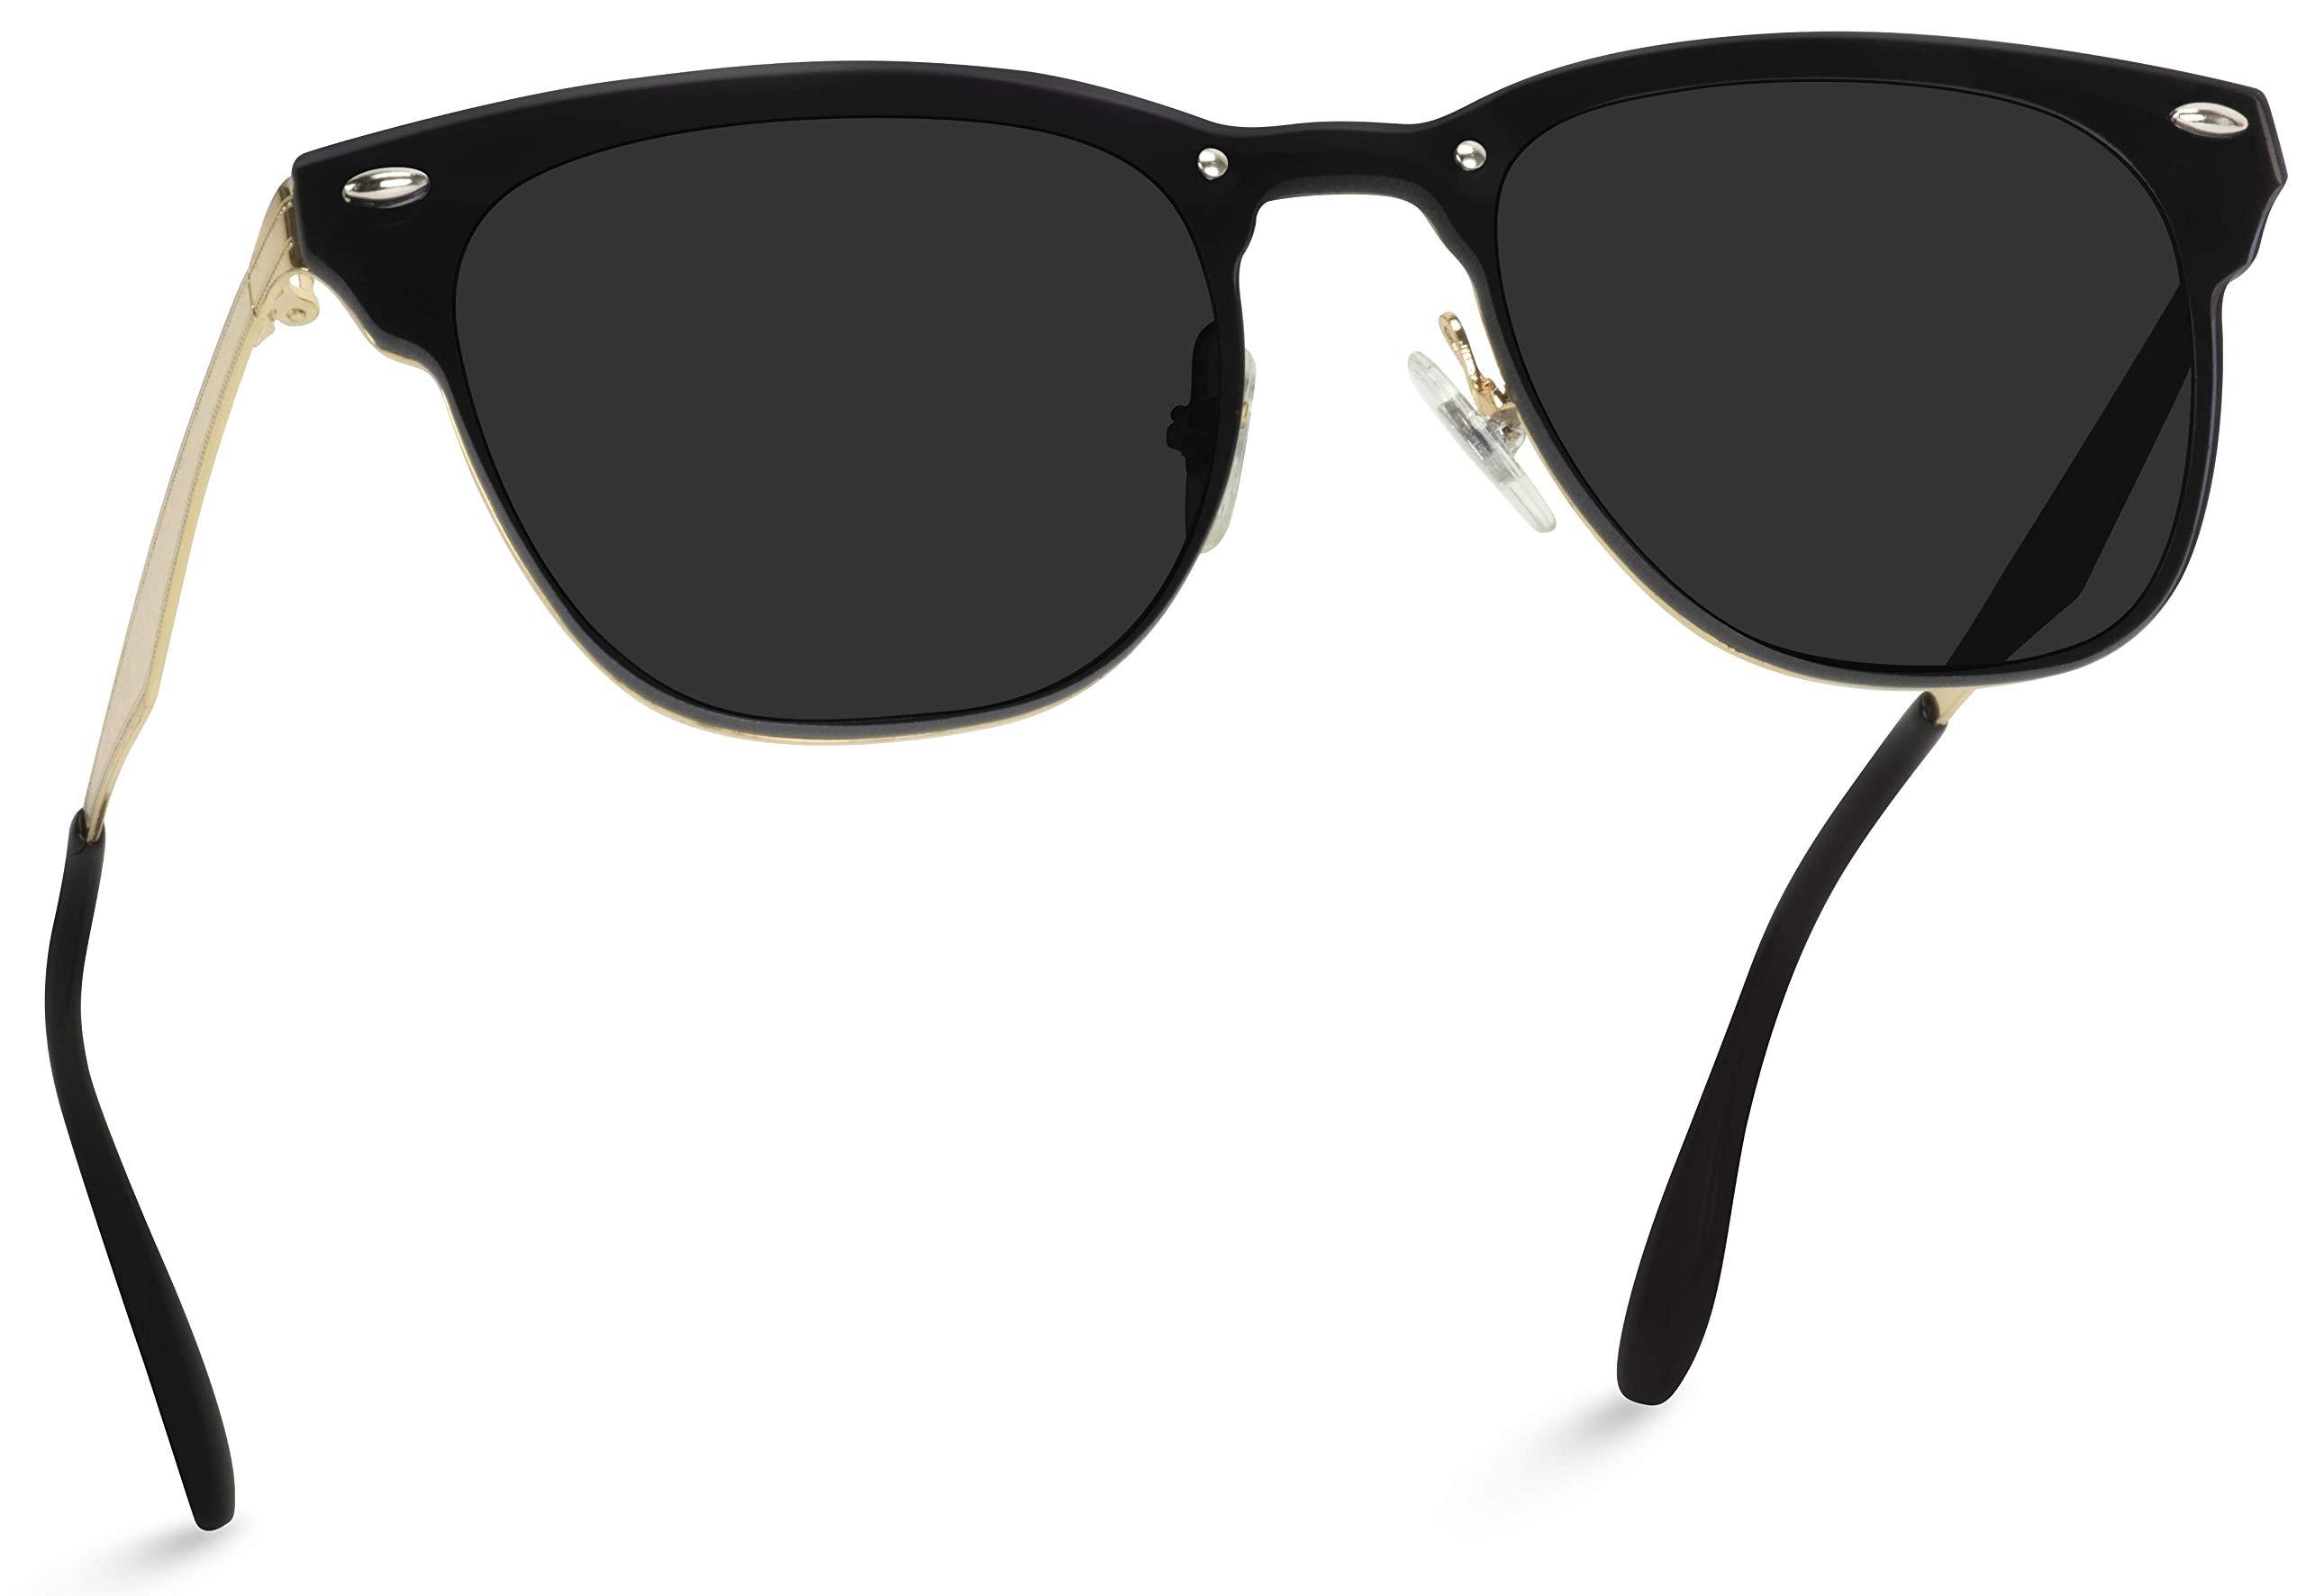 WearMe Pro - Full Mirror Lens Reflective Rimless Retro Sunglasses by WearMe Pro